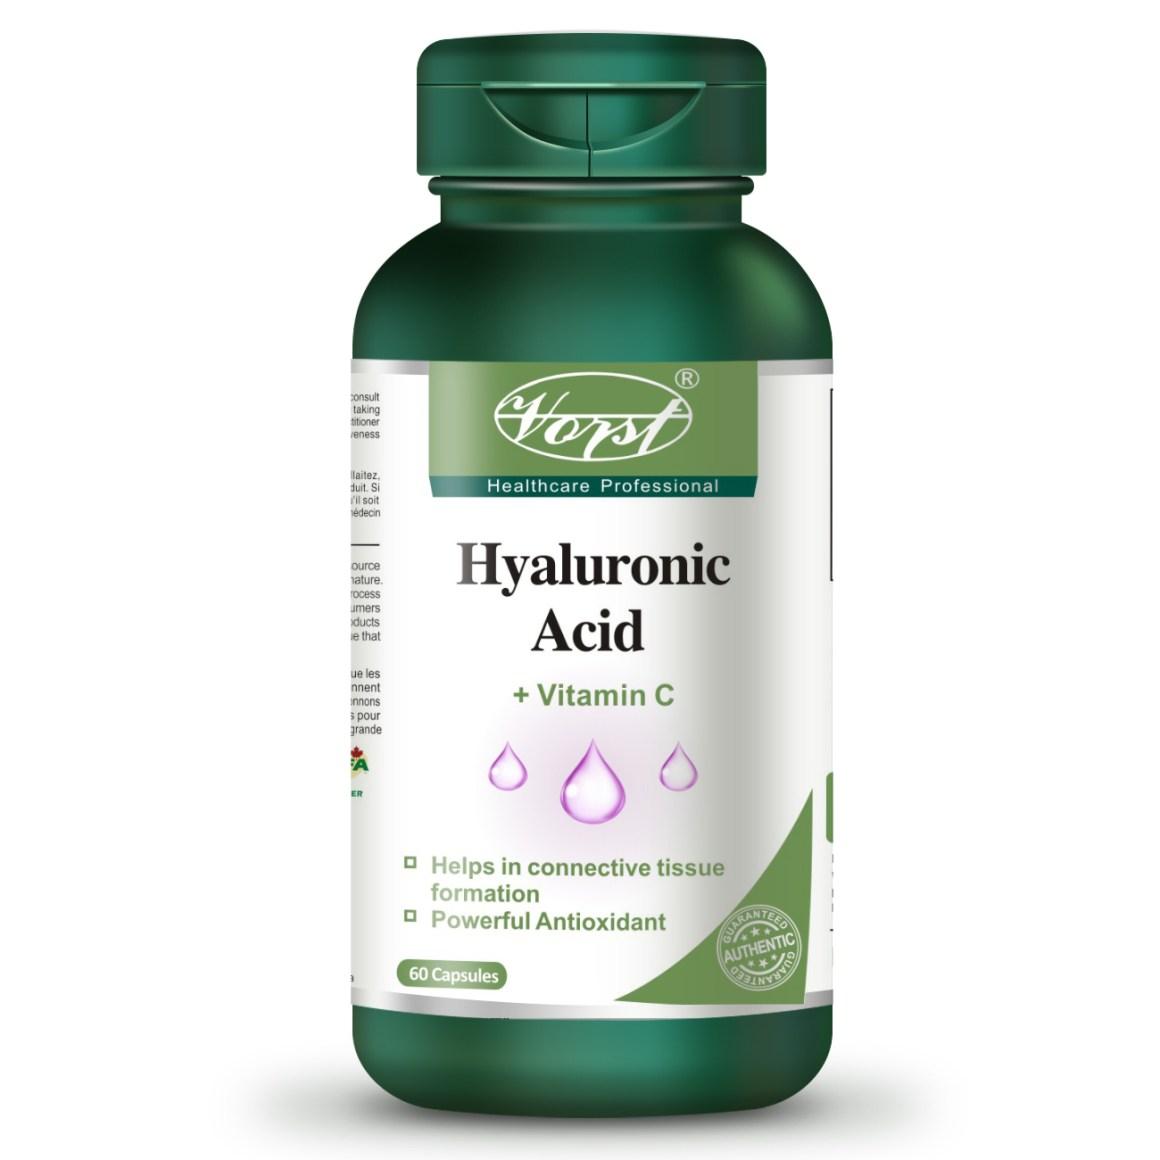 Hyaluronic Acid Bottle